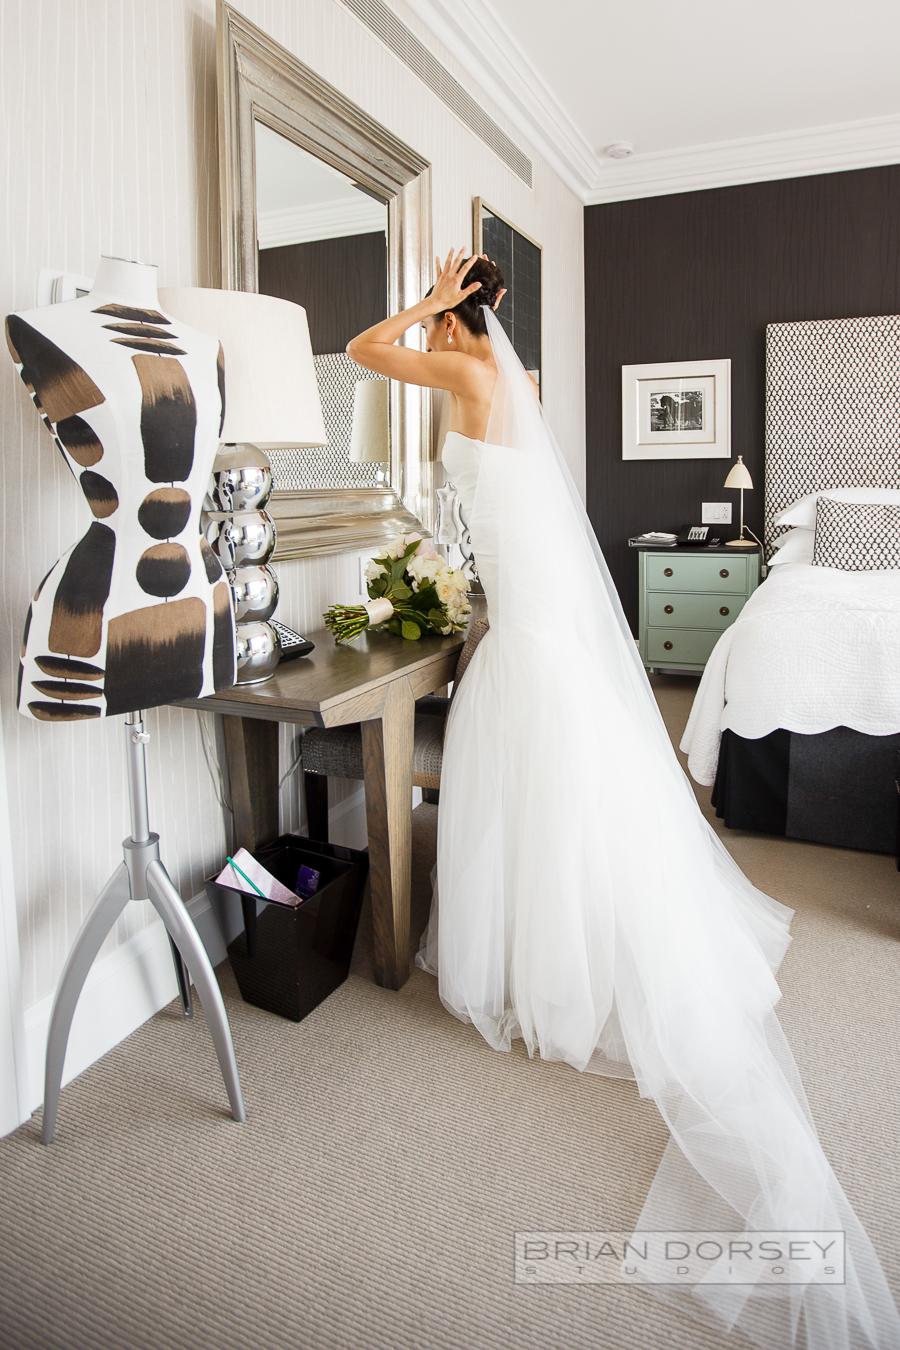 isola nomo soho hotel wedding brian dorsey studios ang weddings and events-8.jpg